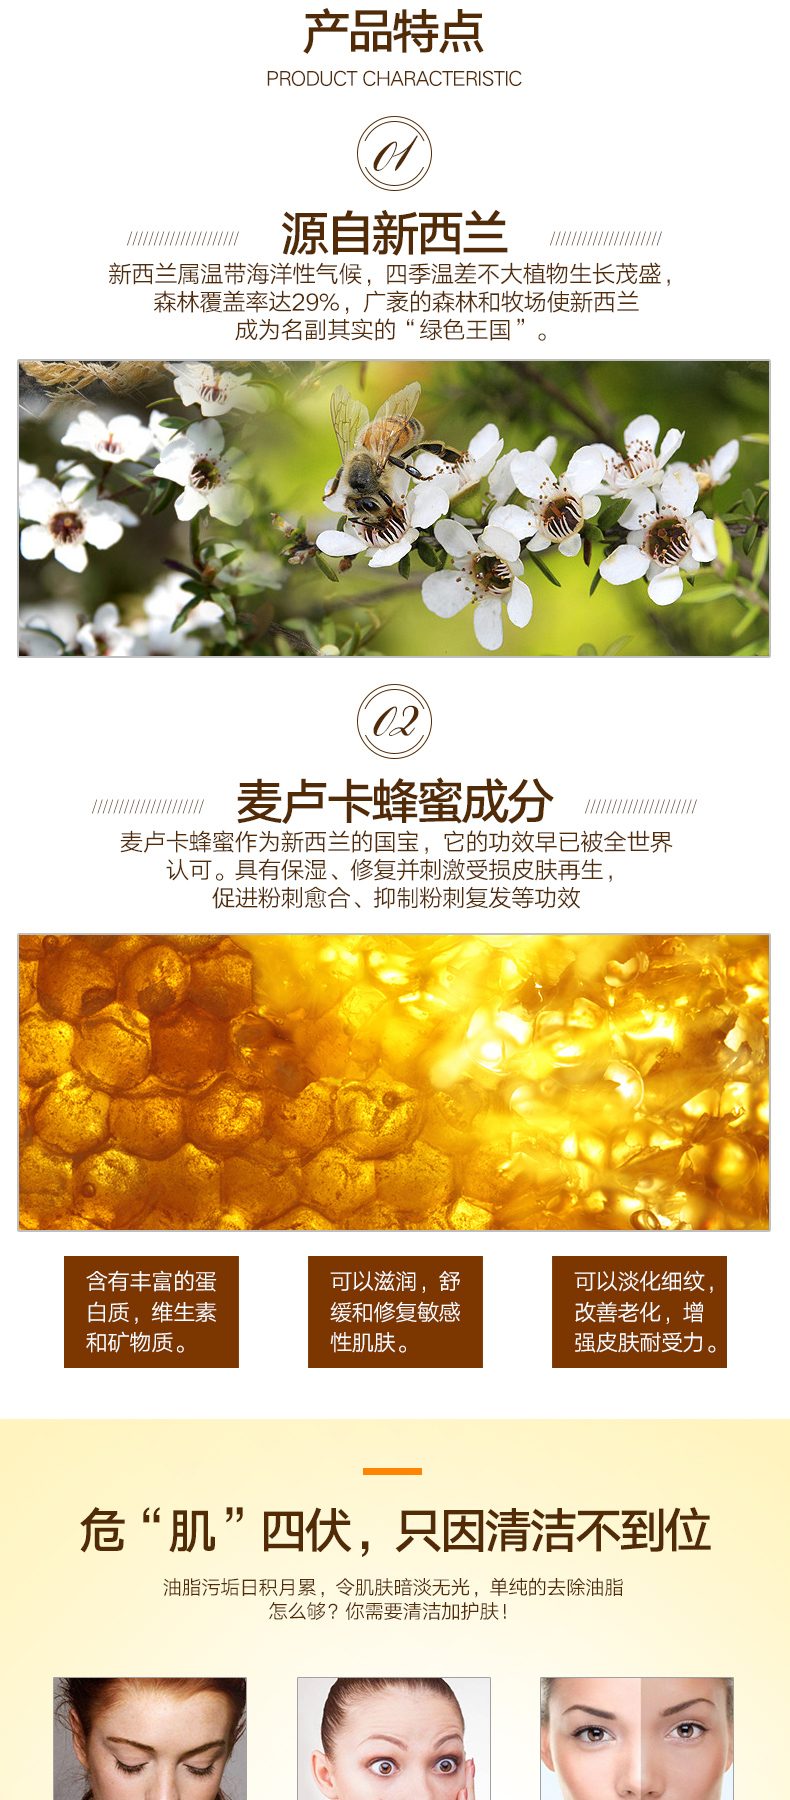 Parrs蜂蜜面膜_02.jpg